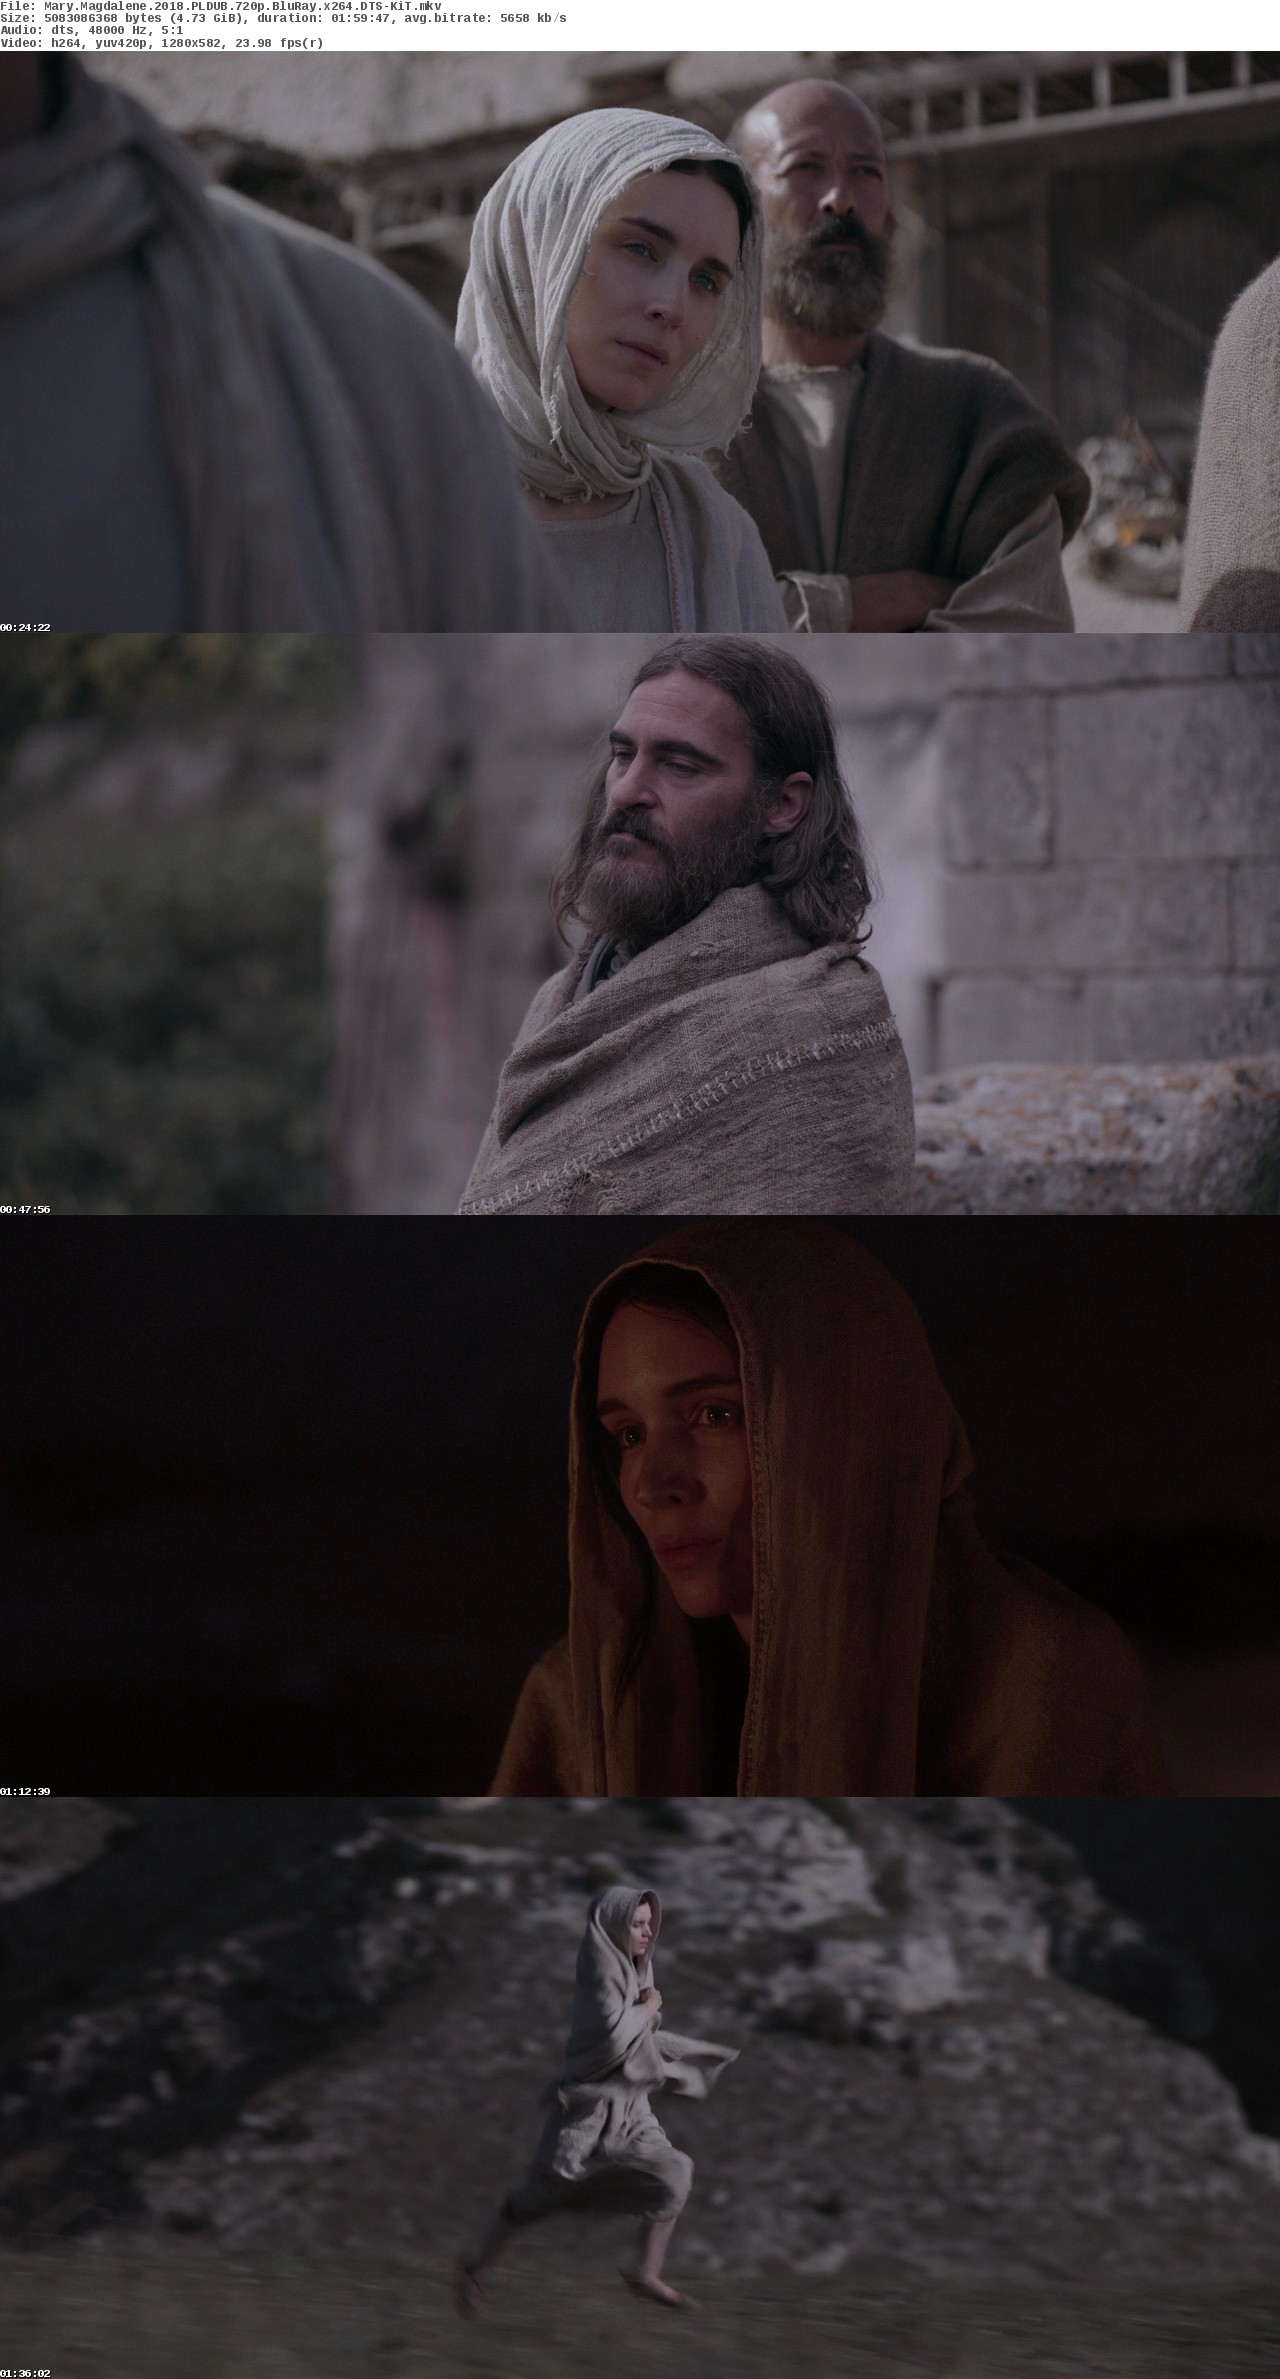 Maria Magdalena / Mary Magdalene (2018)